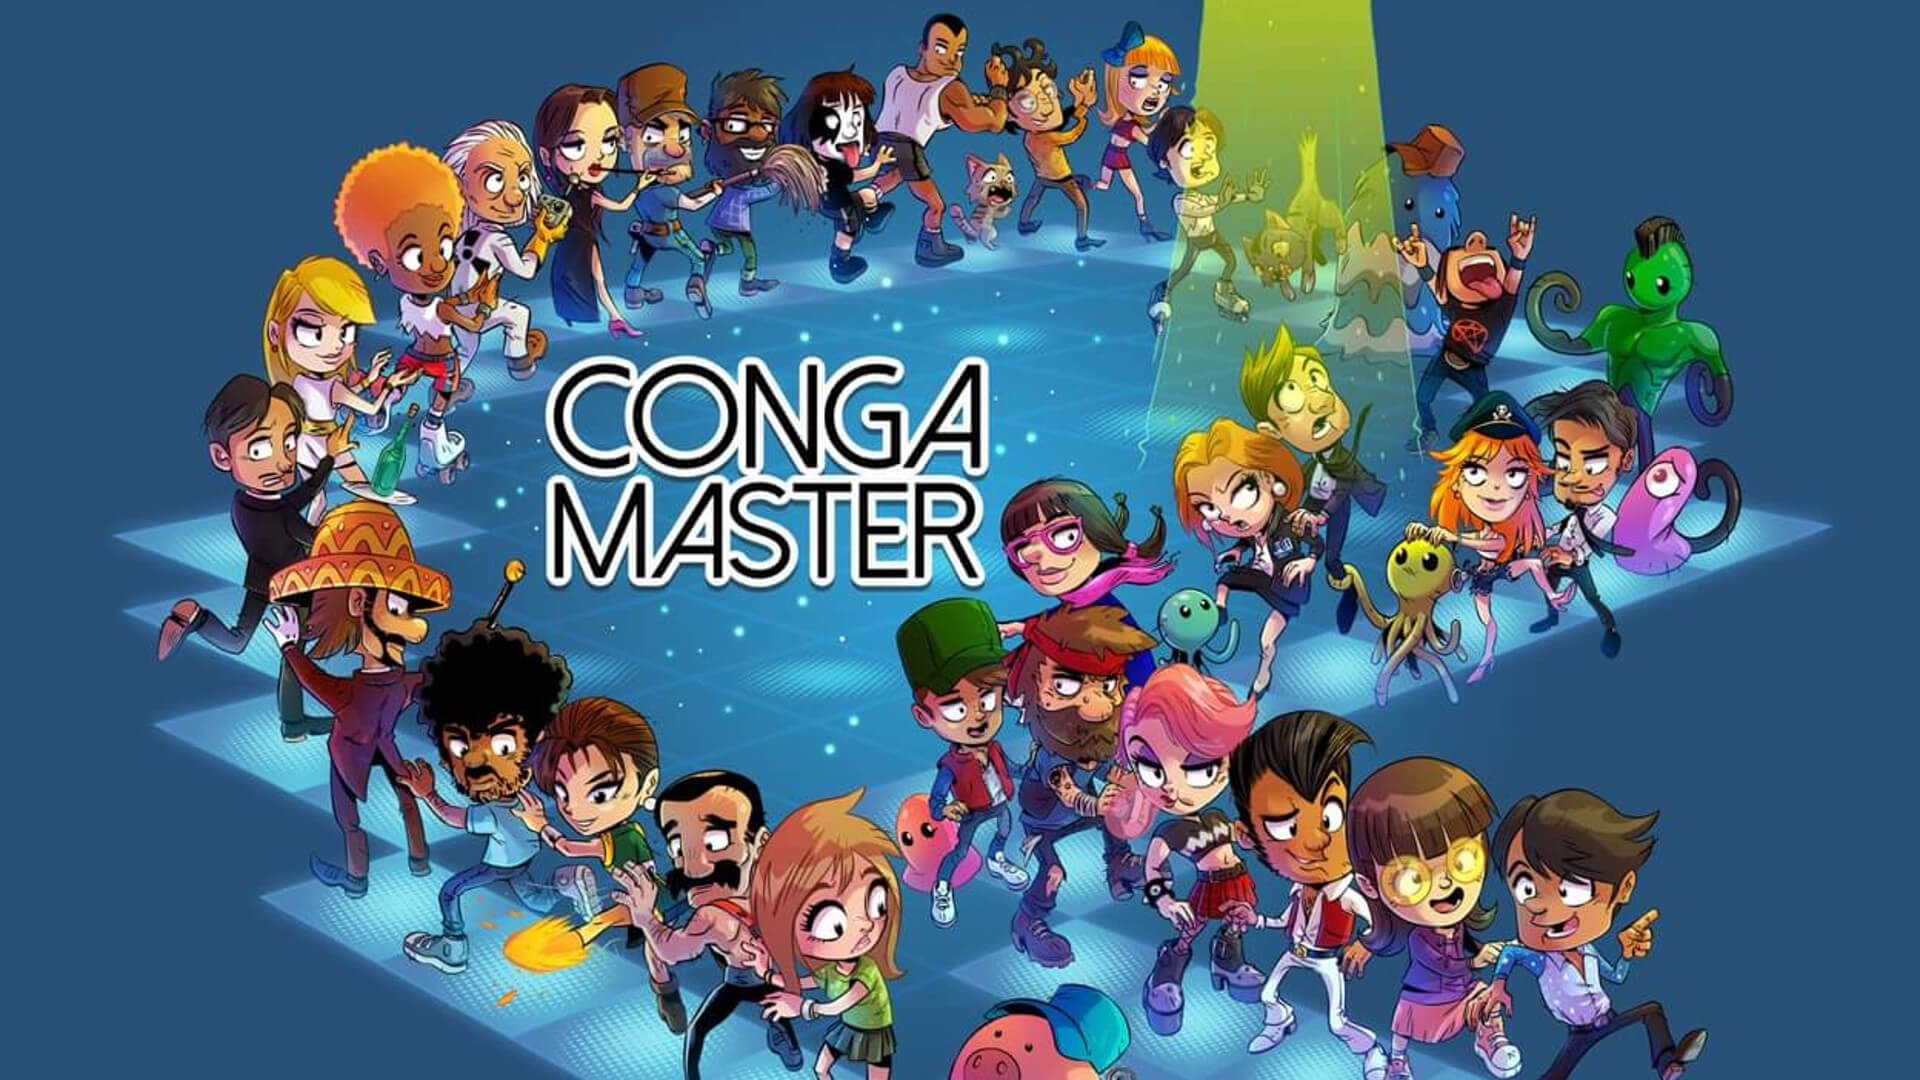 Conga Master Disponible en Précommande sur Xbox One